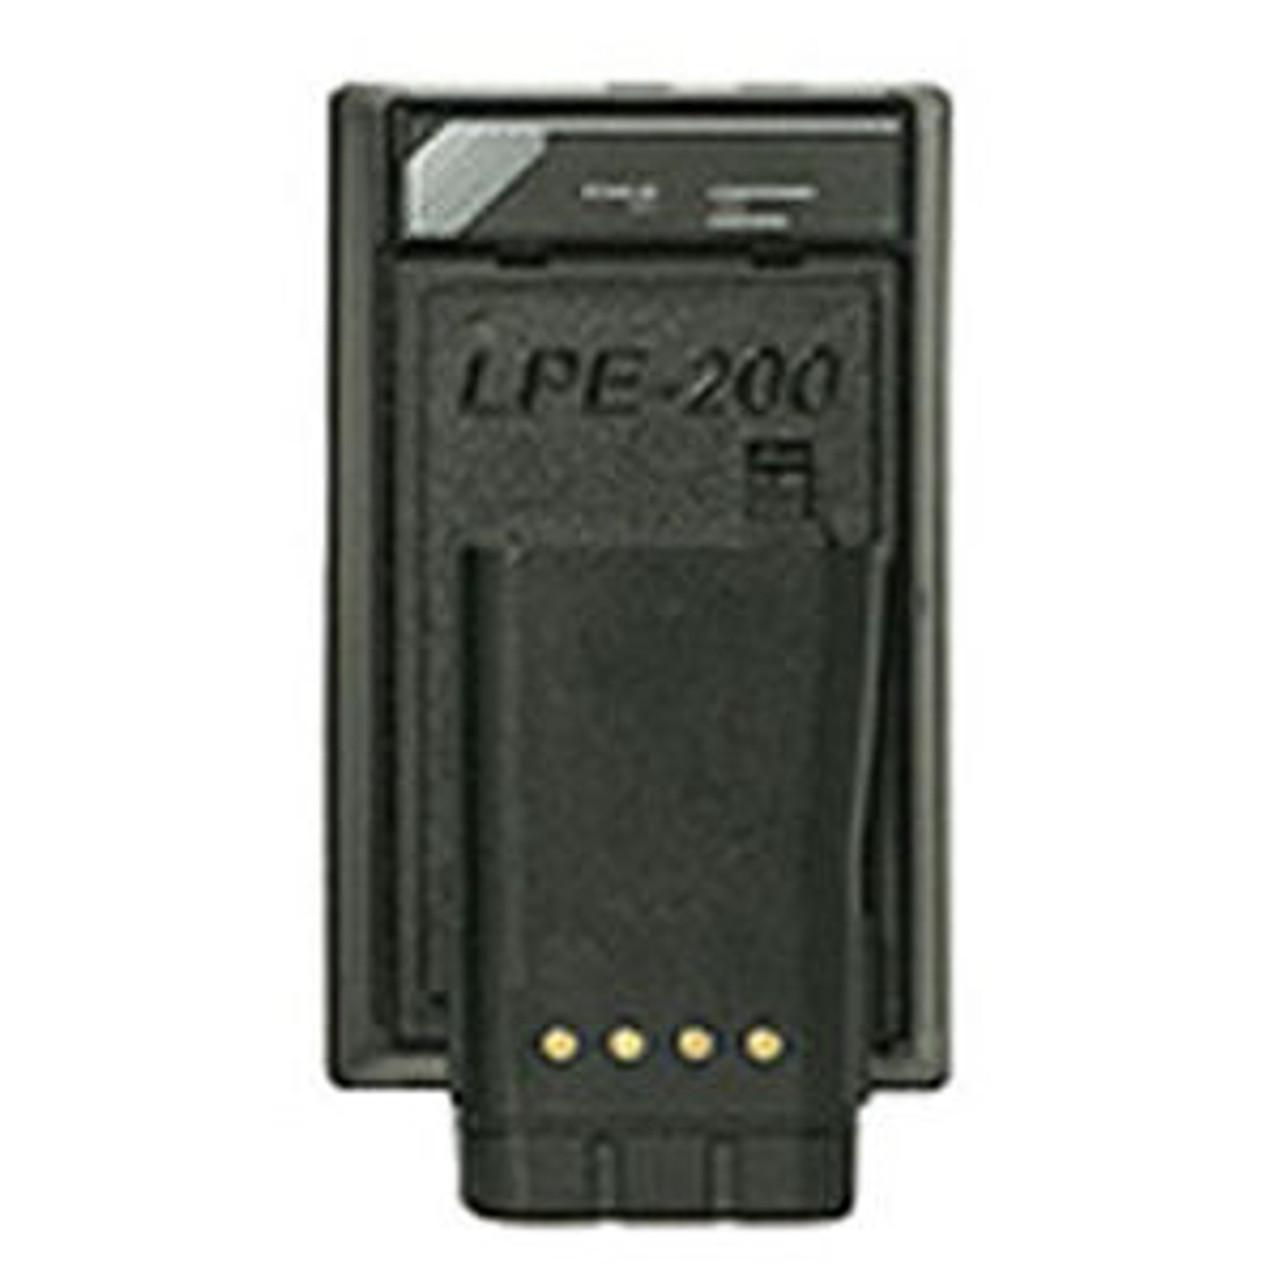 AdvanceTec Single Slot Conditioning Charger For Datron Guardian Lithium Batteries